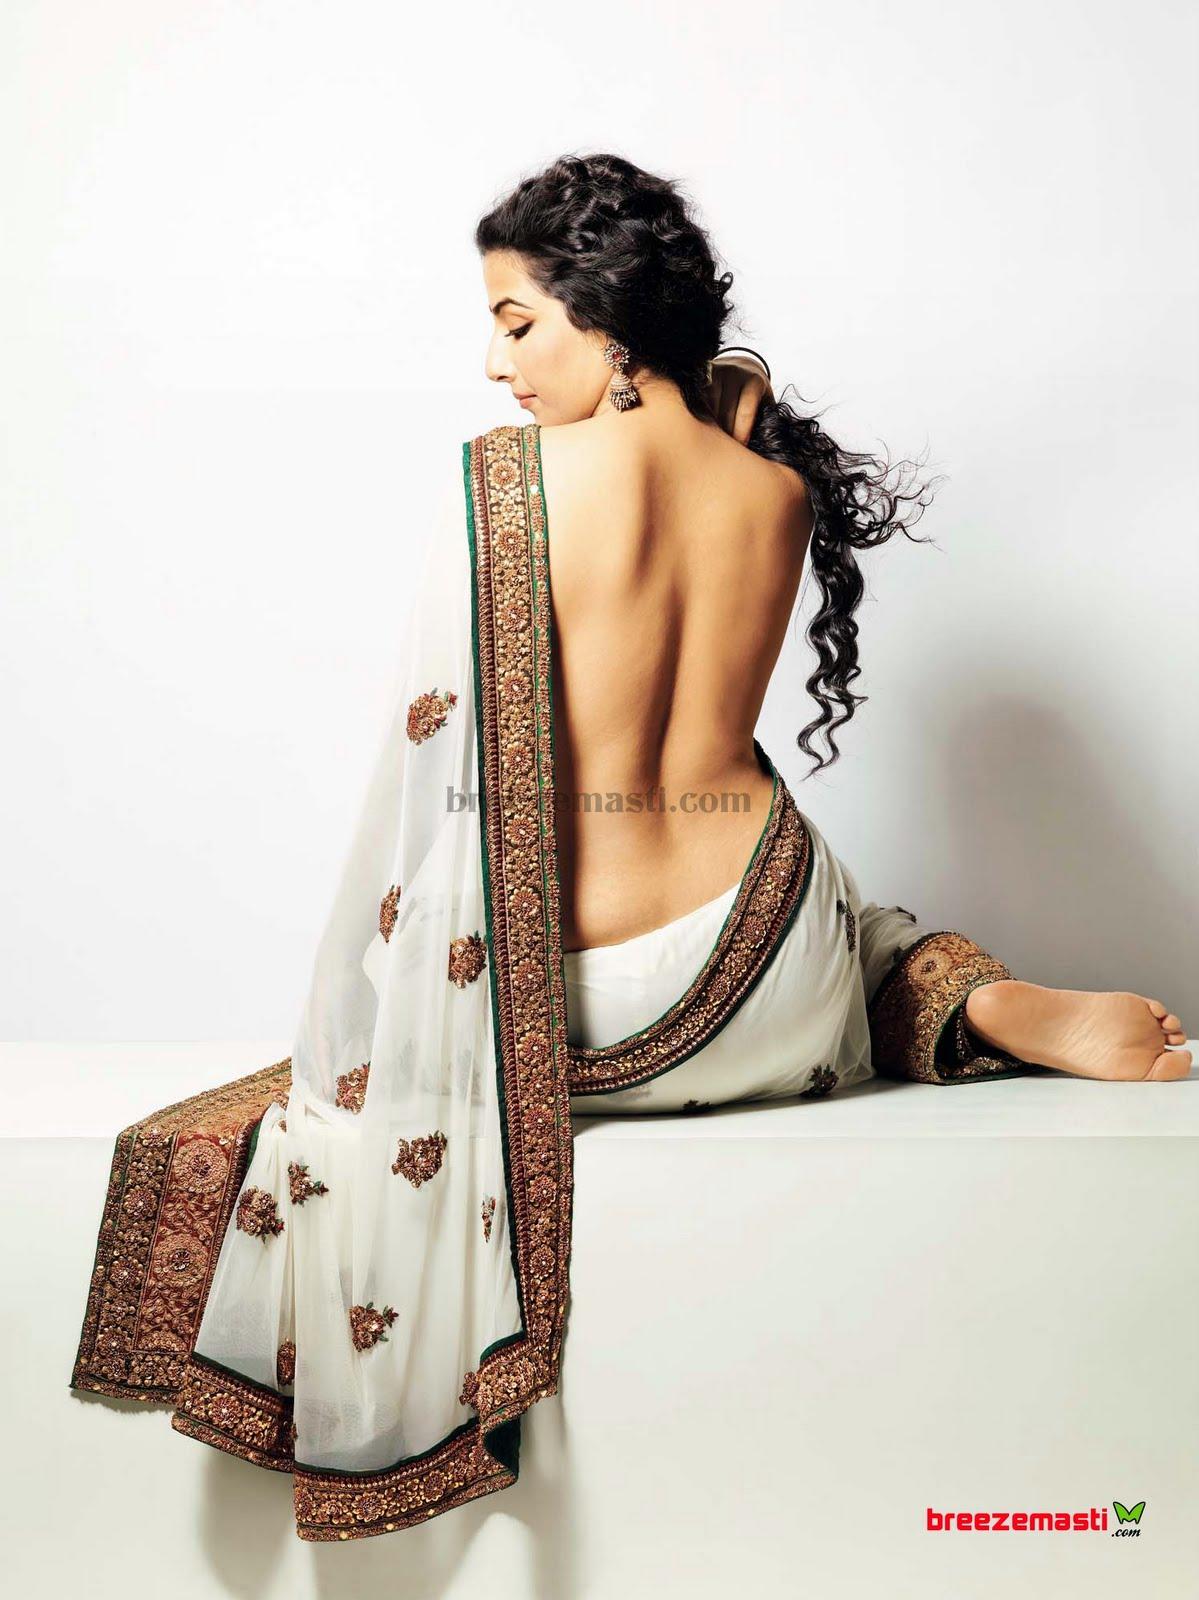 http://1.bp.blogspot.com/-HY-3upLj0Xo/TdK5kPji8FI/AAAAAAAAd5M/I7iwDwOlyCU/s1600/vidhya_balan_hot__stills__3_.jpg